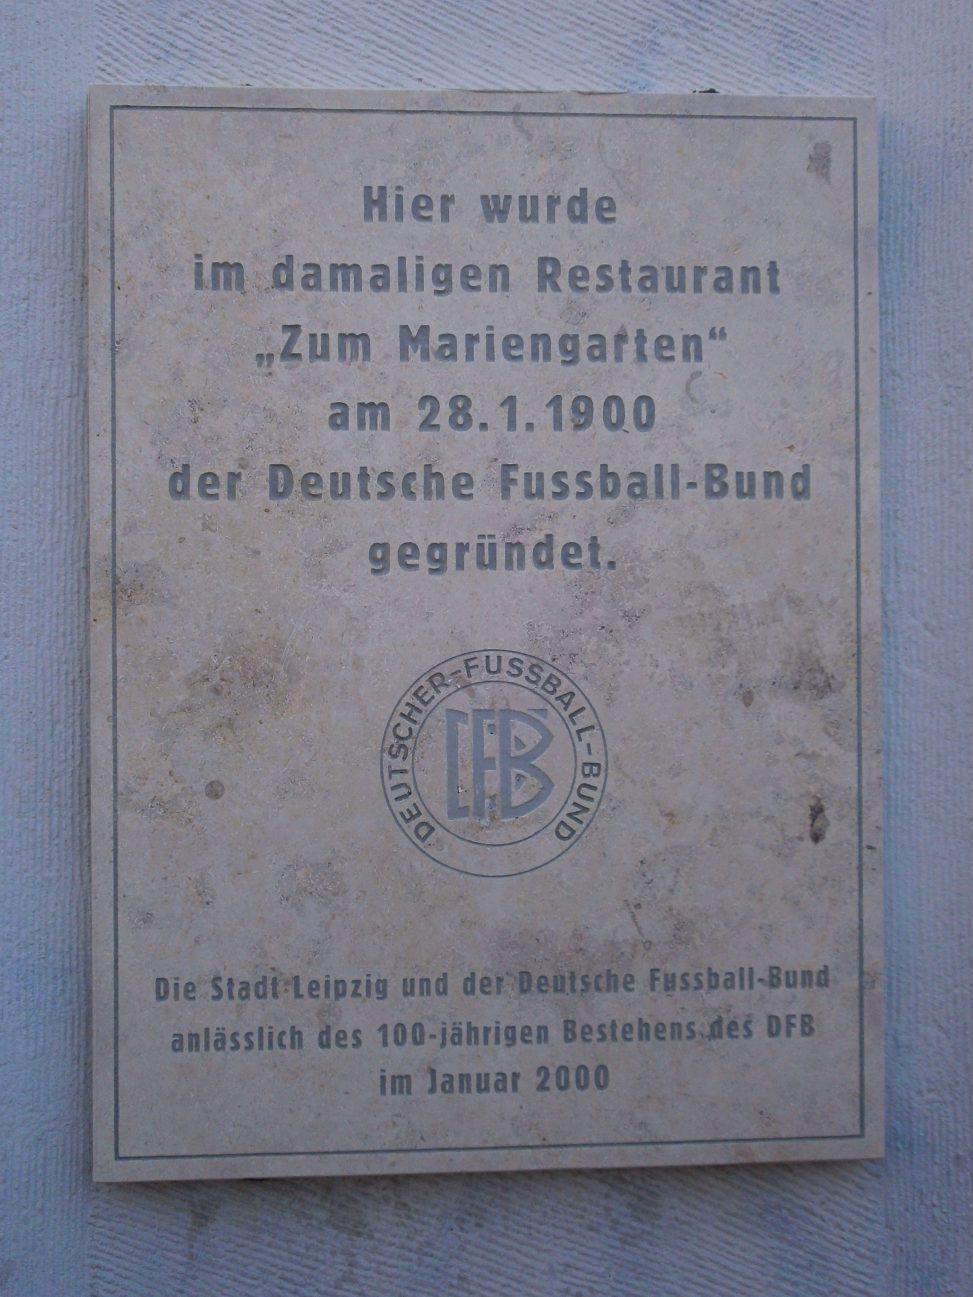 Gründungsstätte des DFB, Leipzig